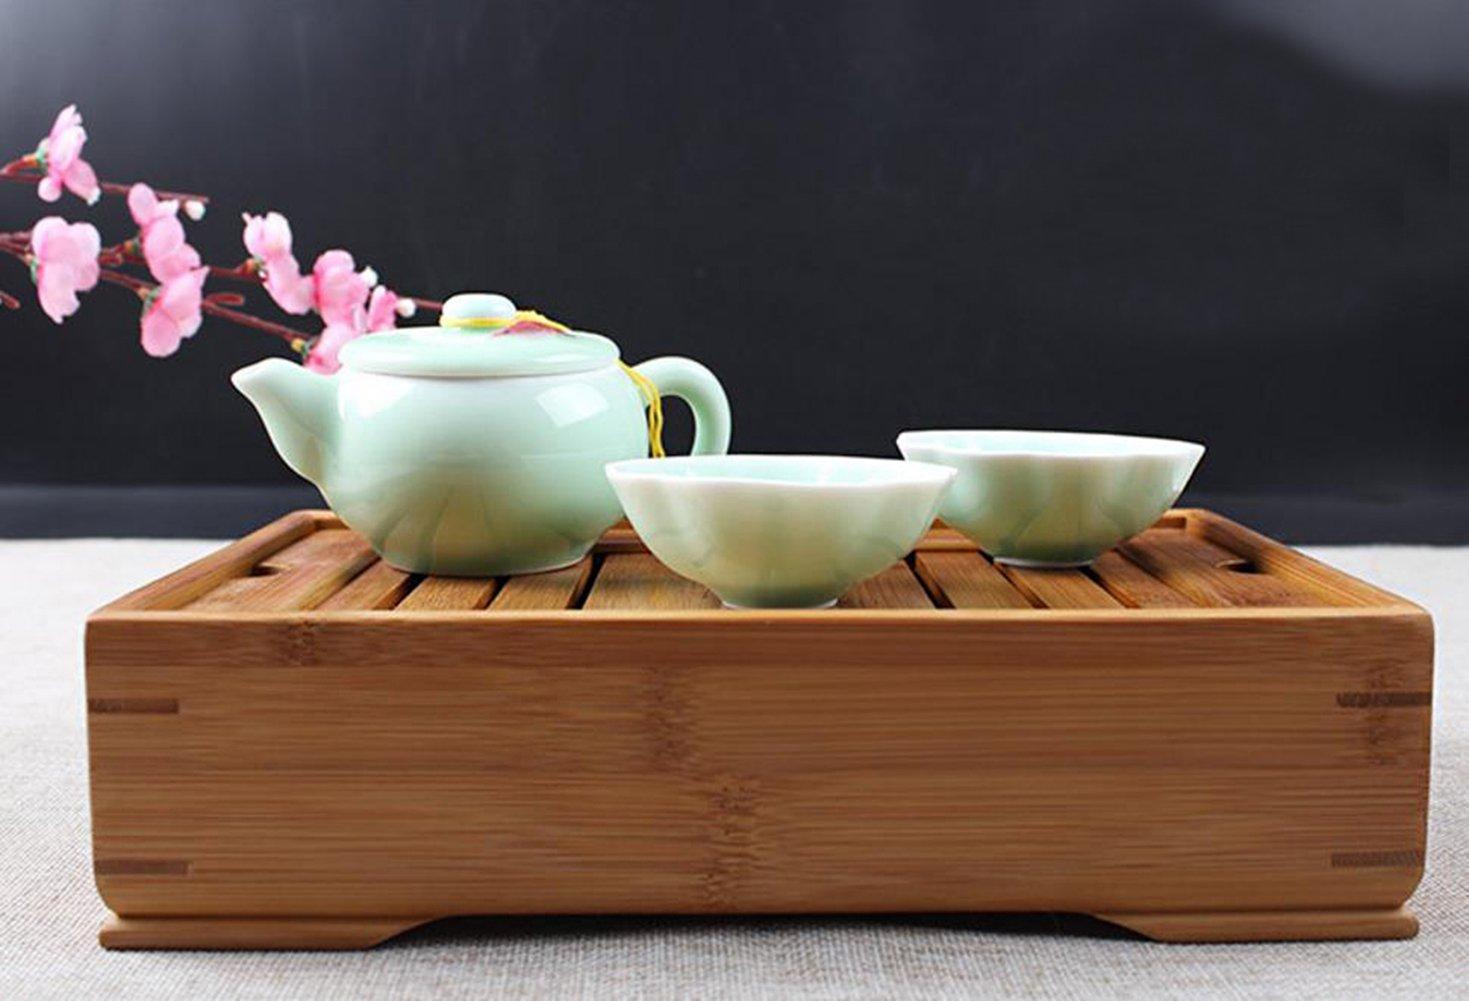 Hoobar Reservoir Type Bamboo Tea Tray - Chinese Kungfu Tea Table Serving Tray Box for Kungfu Tea Set by JKCOM (Image #2)